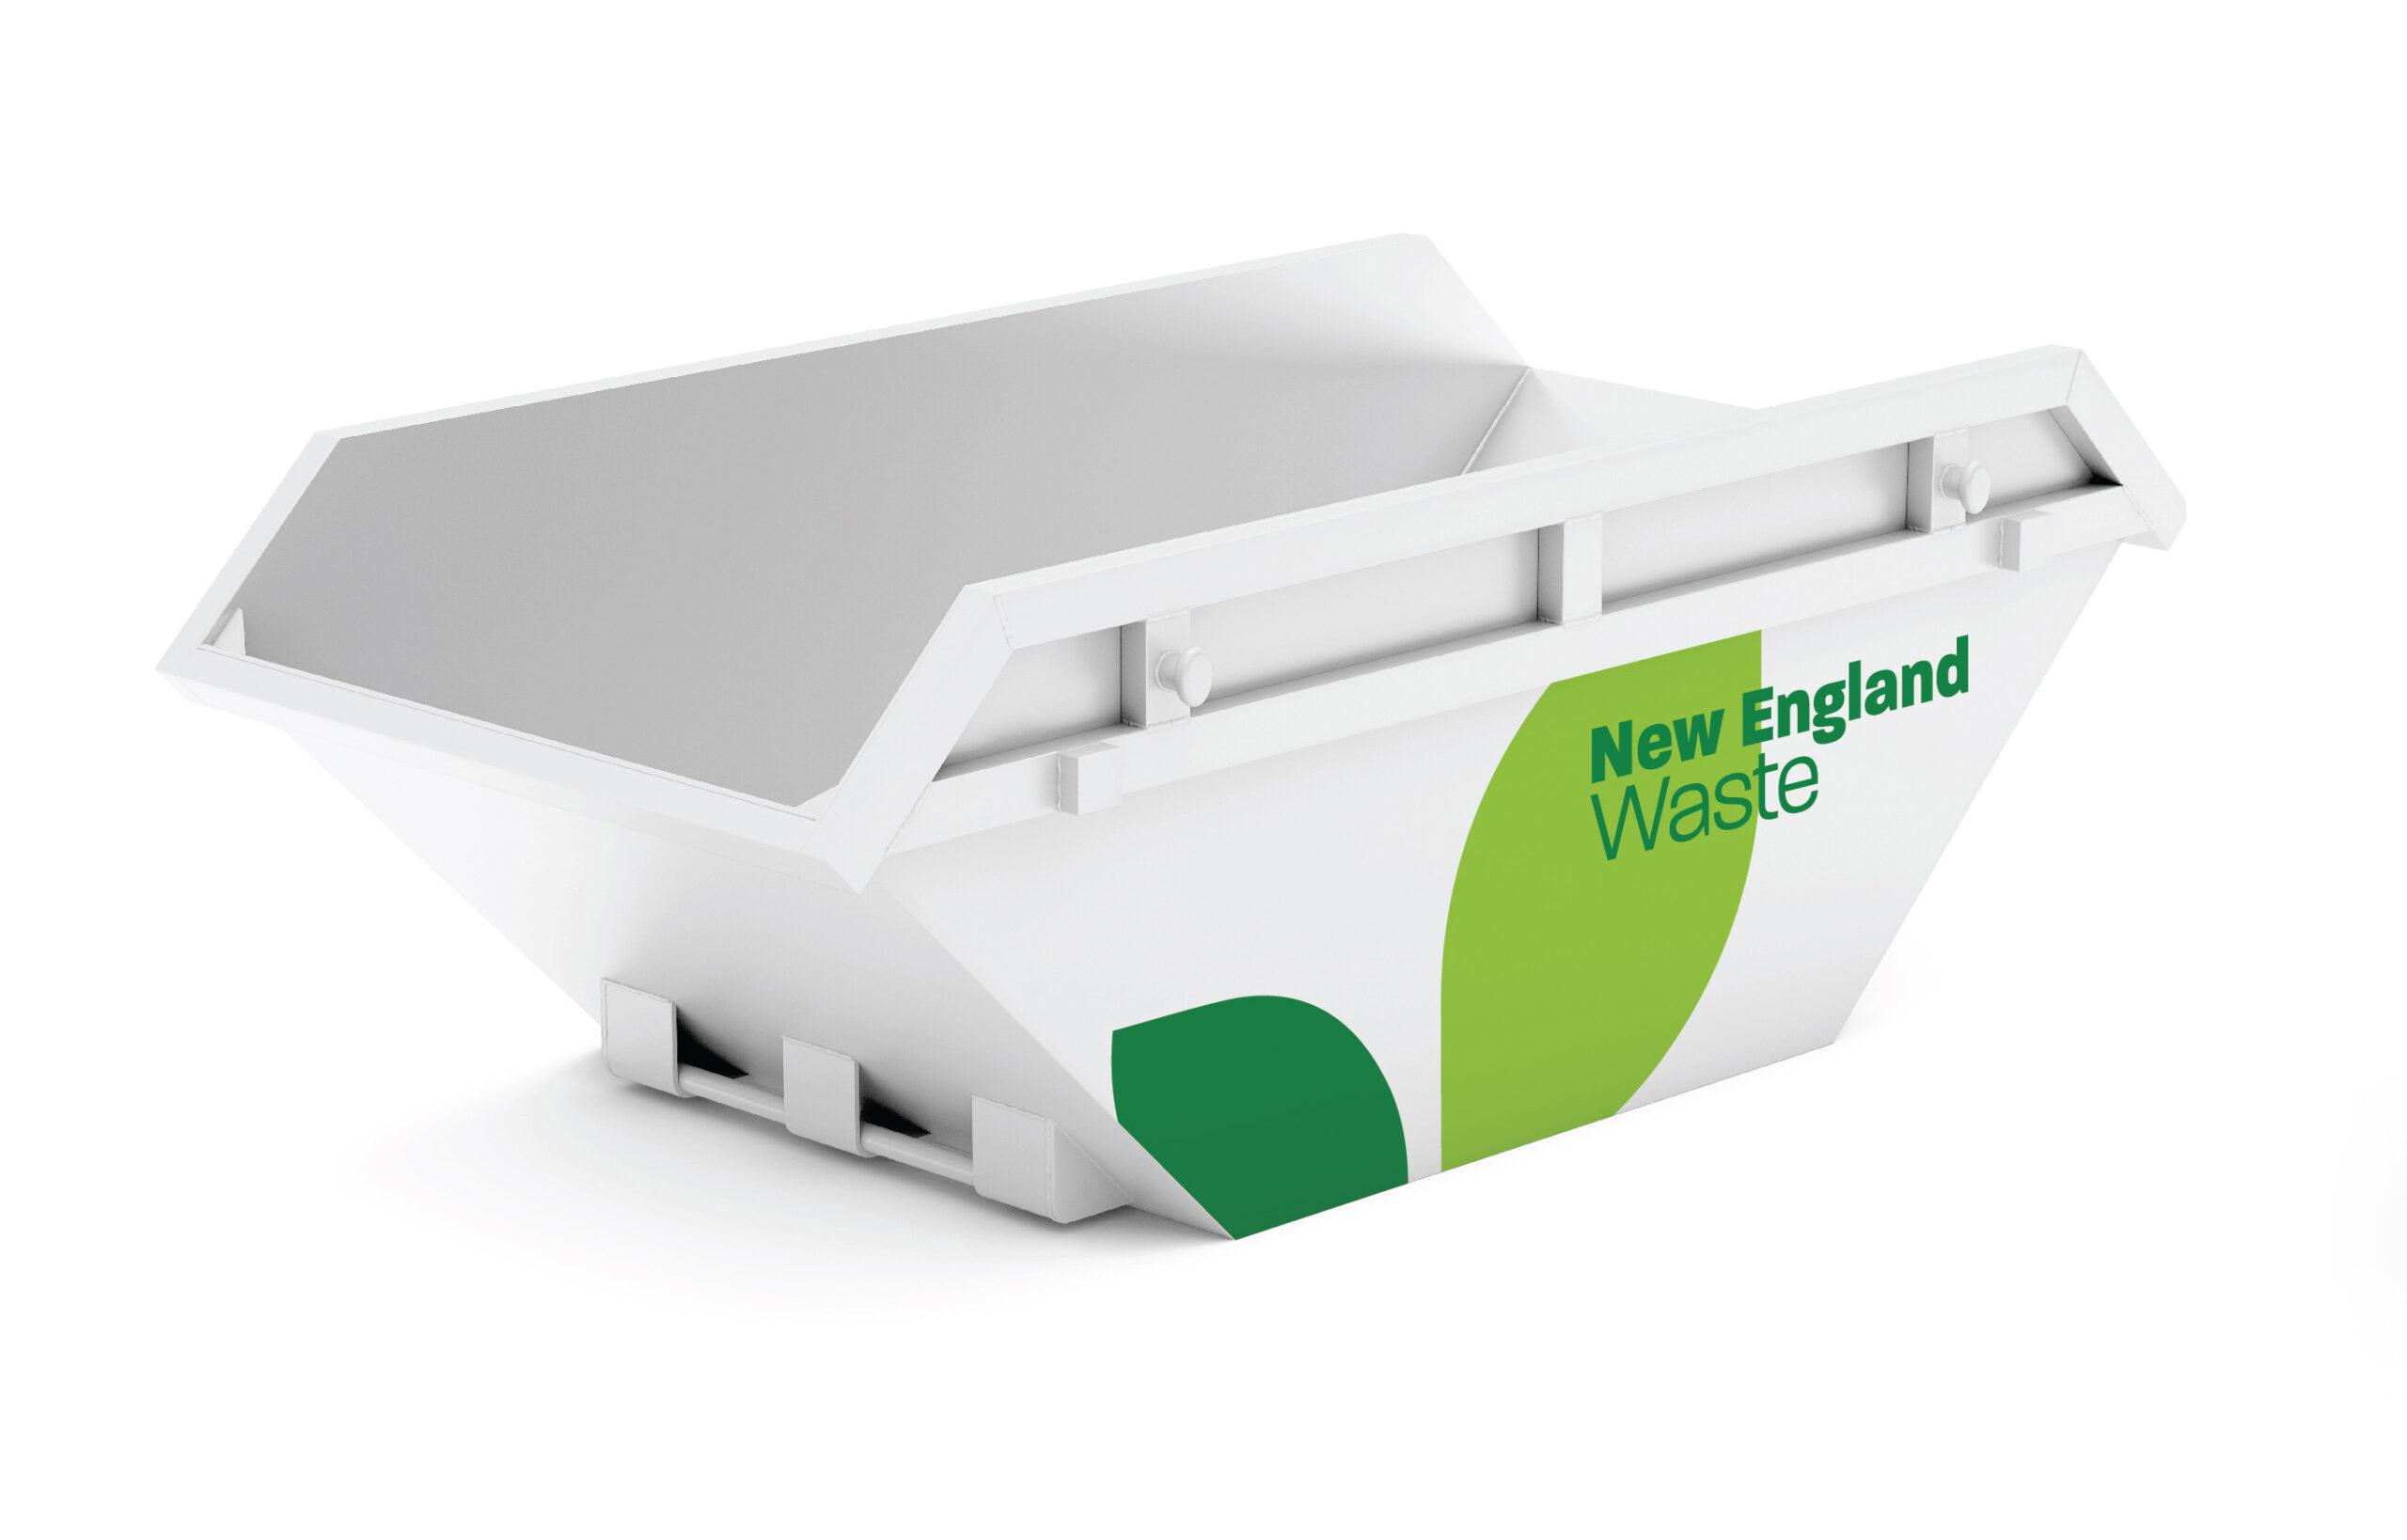 New England Waste Skip Bin